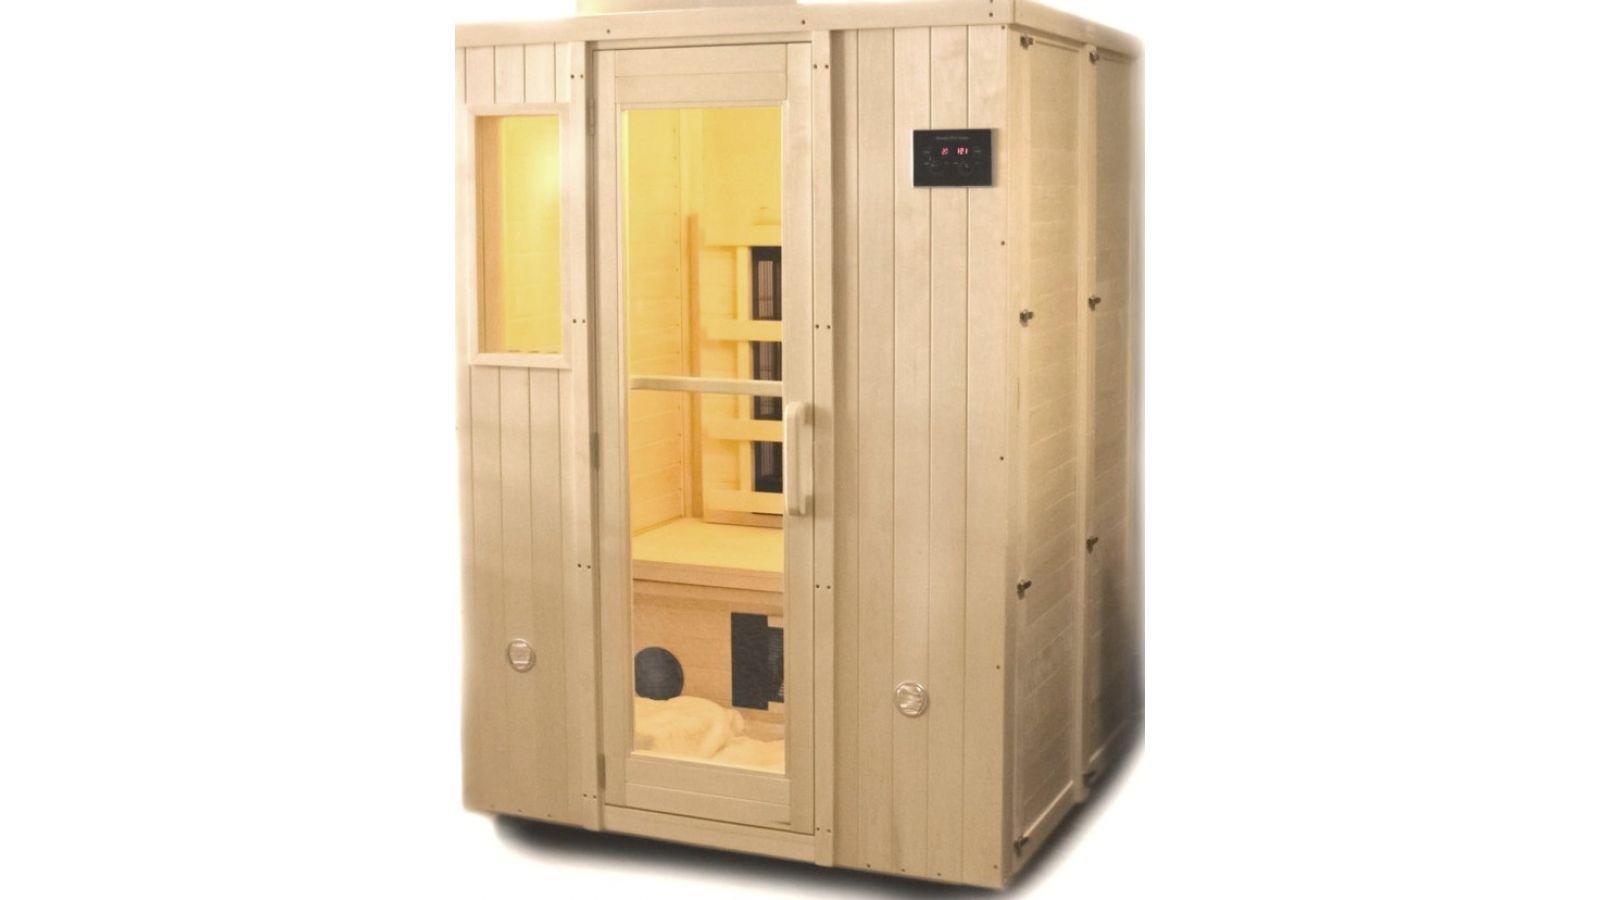 Heavenly Heat 2 Person Far Infrared Sauna